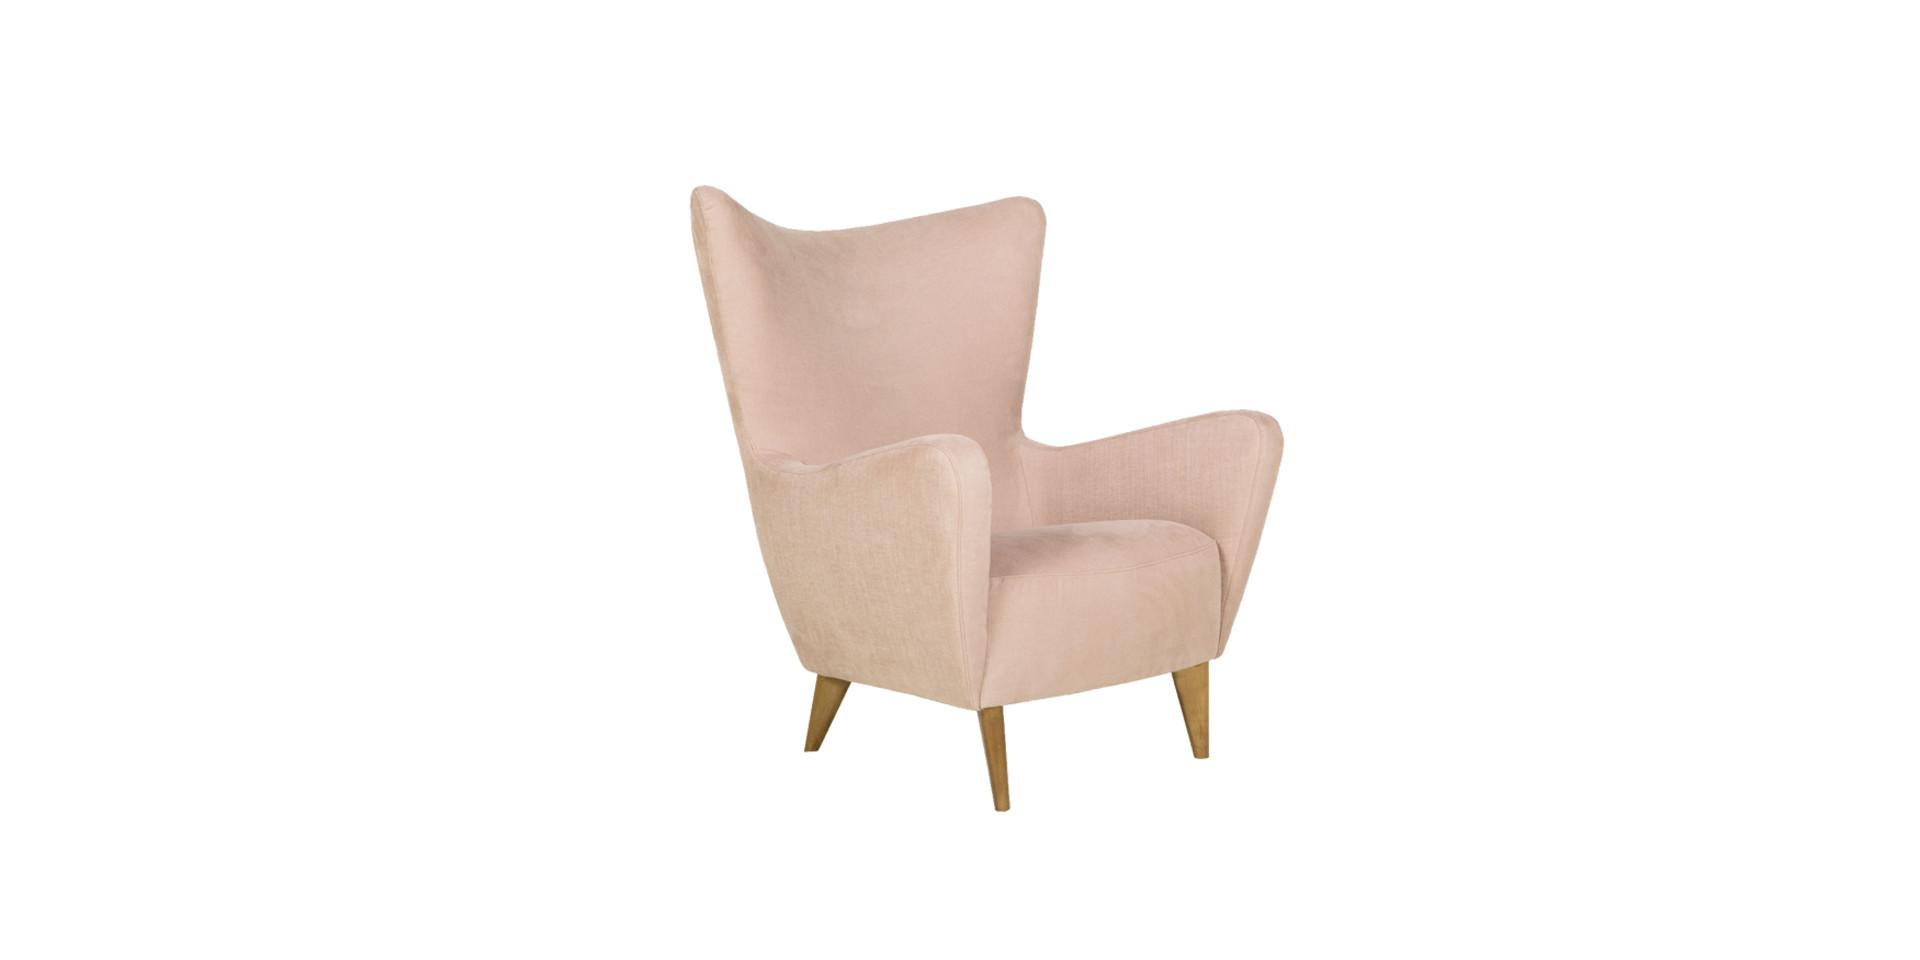 sits-elsa-fauteuil-armchair_caleido2994_light_brown_2